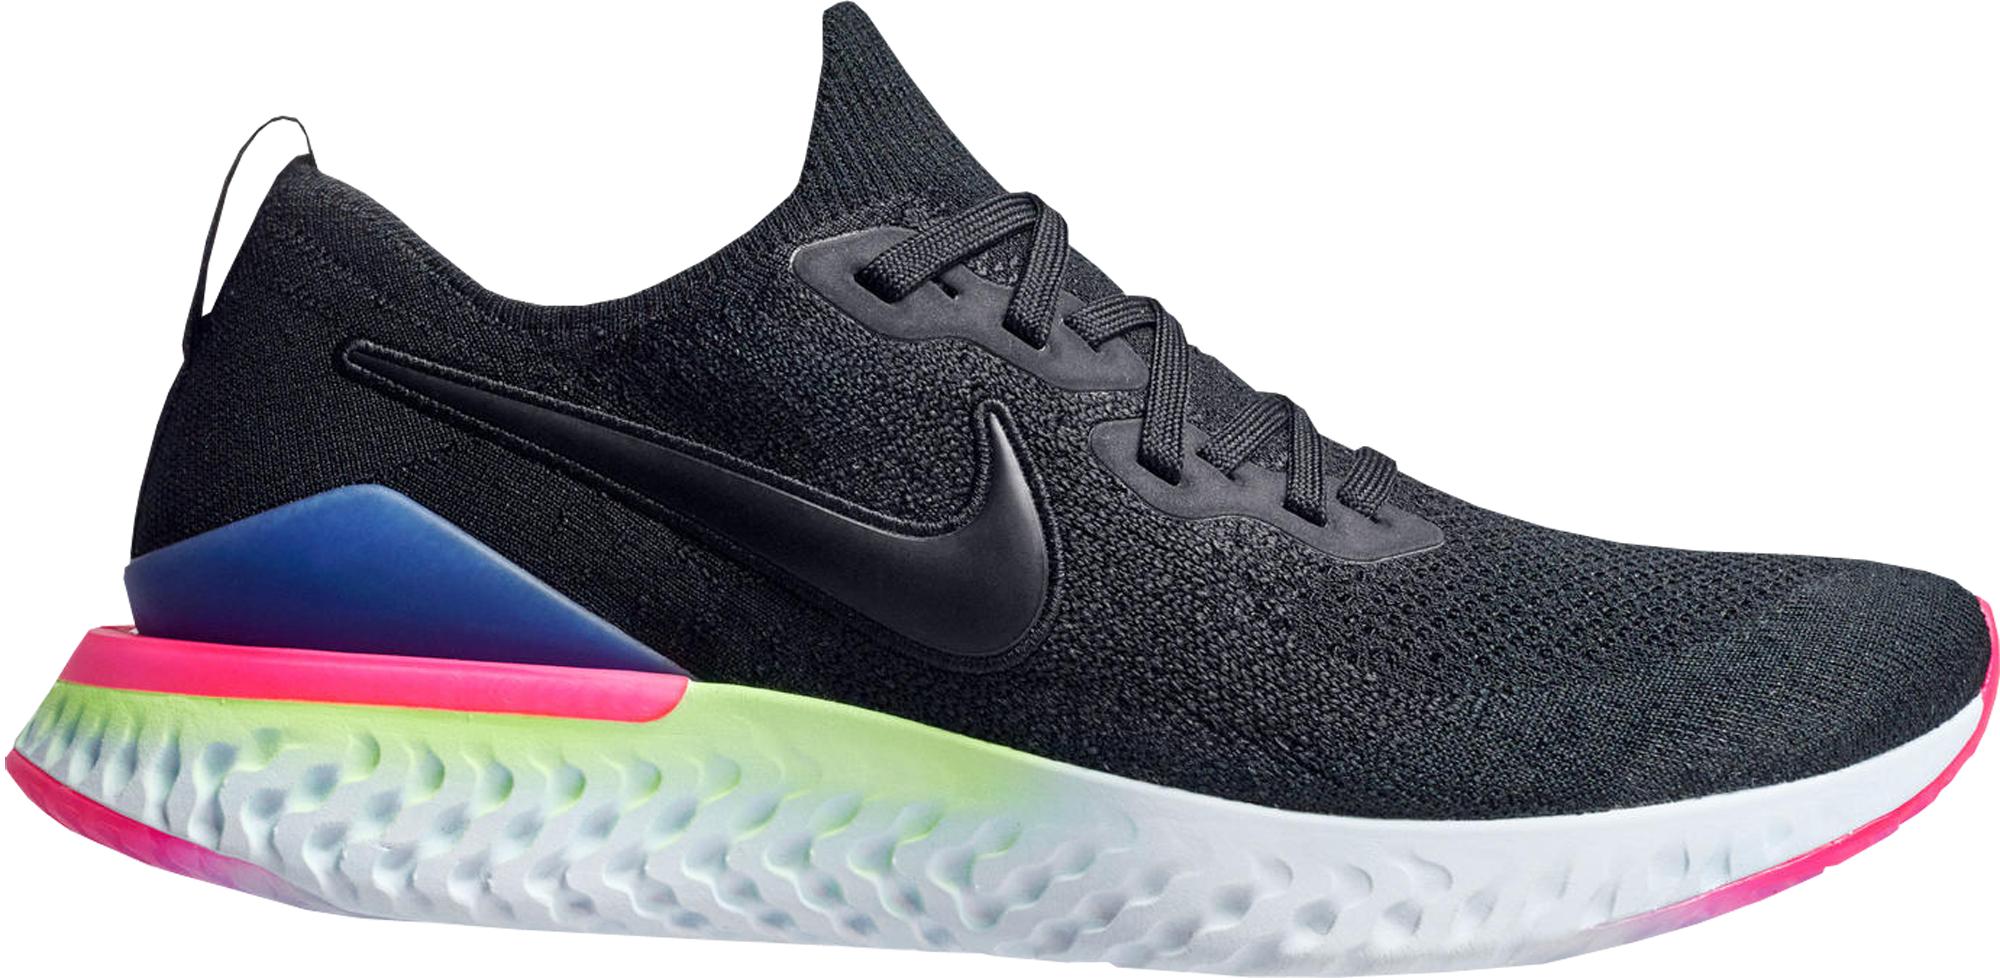 Nike Epic React Flyknit 2 Pixel